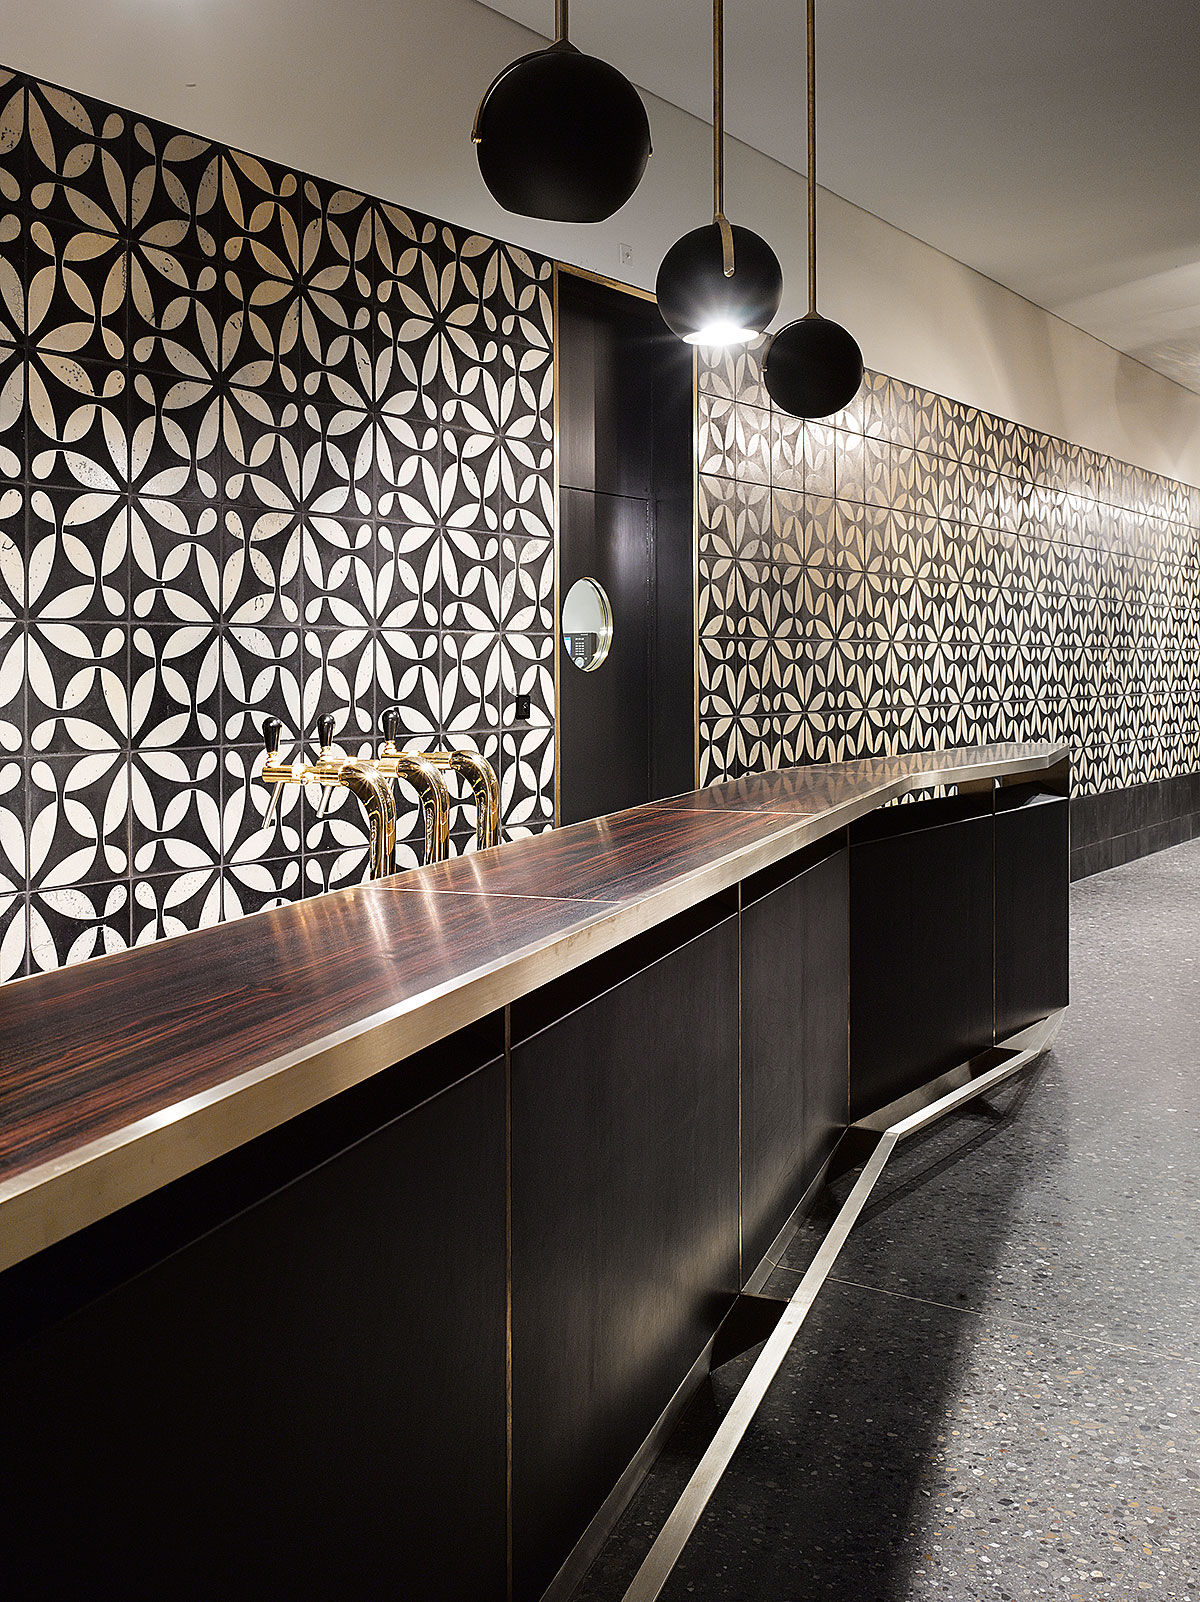 Hohes Haus West: Cafébar im EG